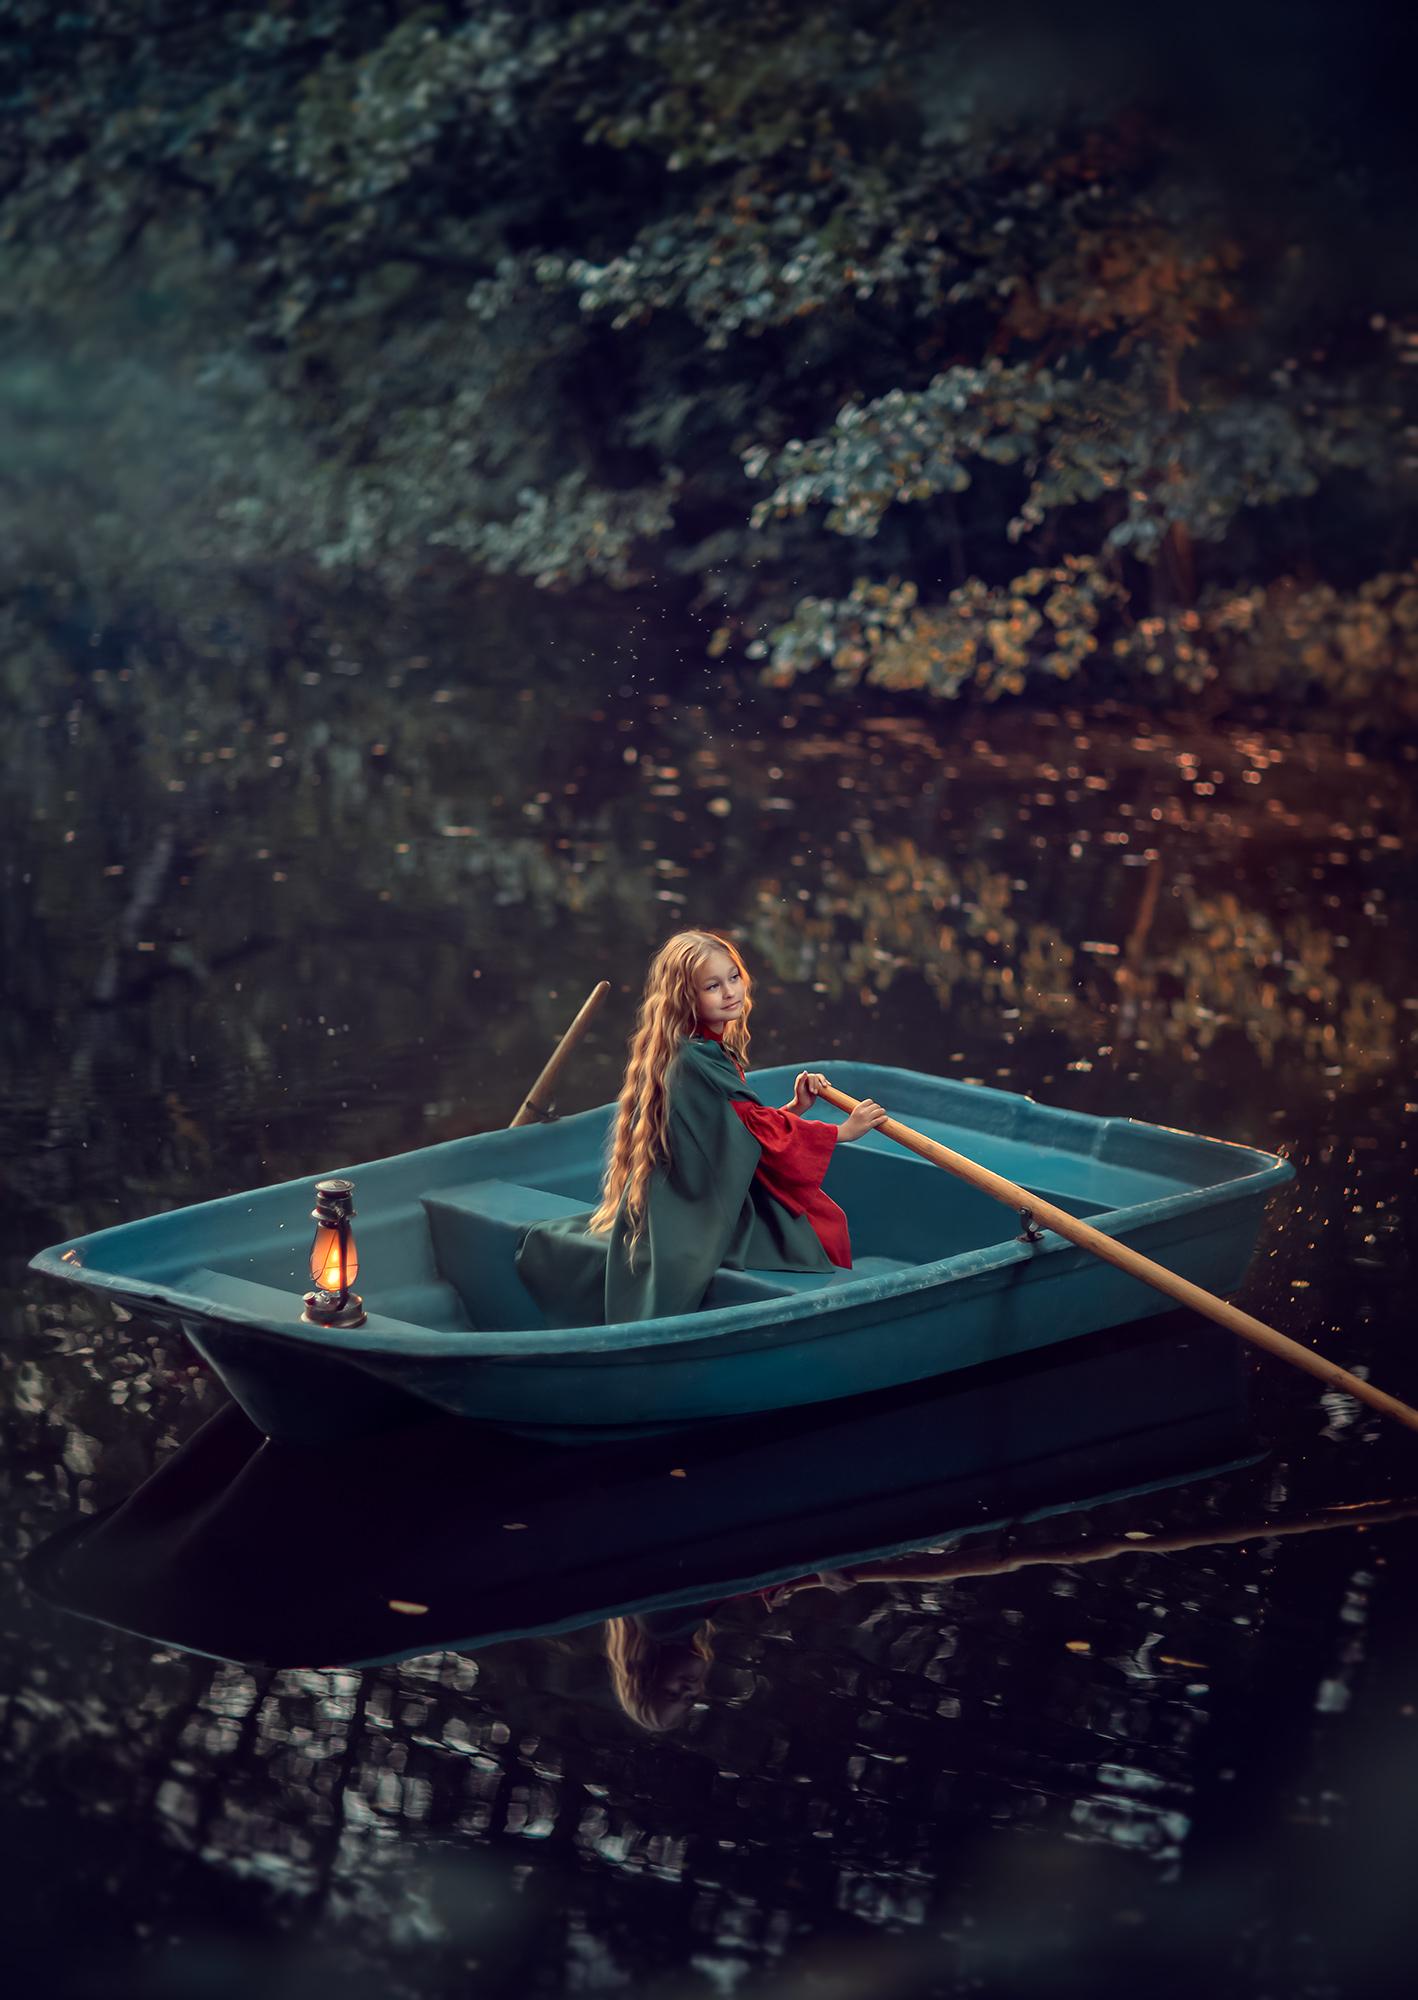 Фотосессия для девочки в лодке. Фотосессия на природе. Портретная фотосессия для девочки